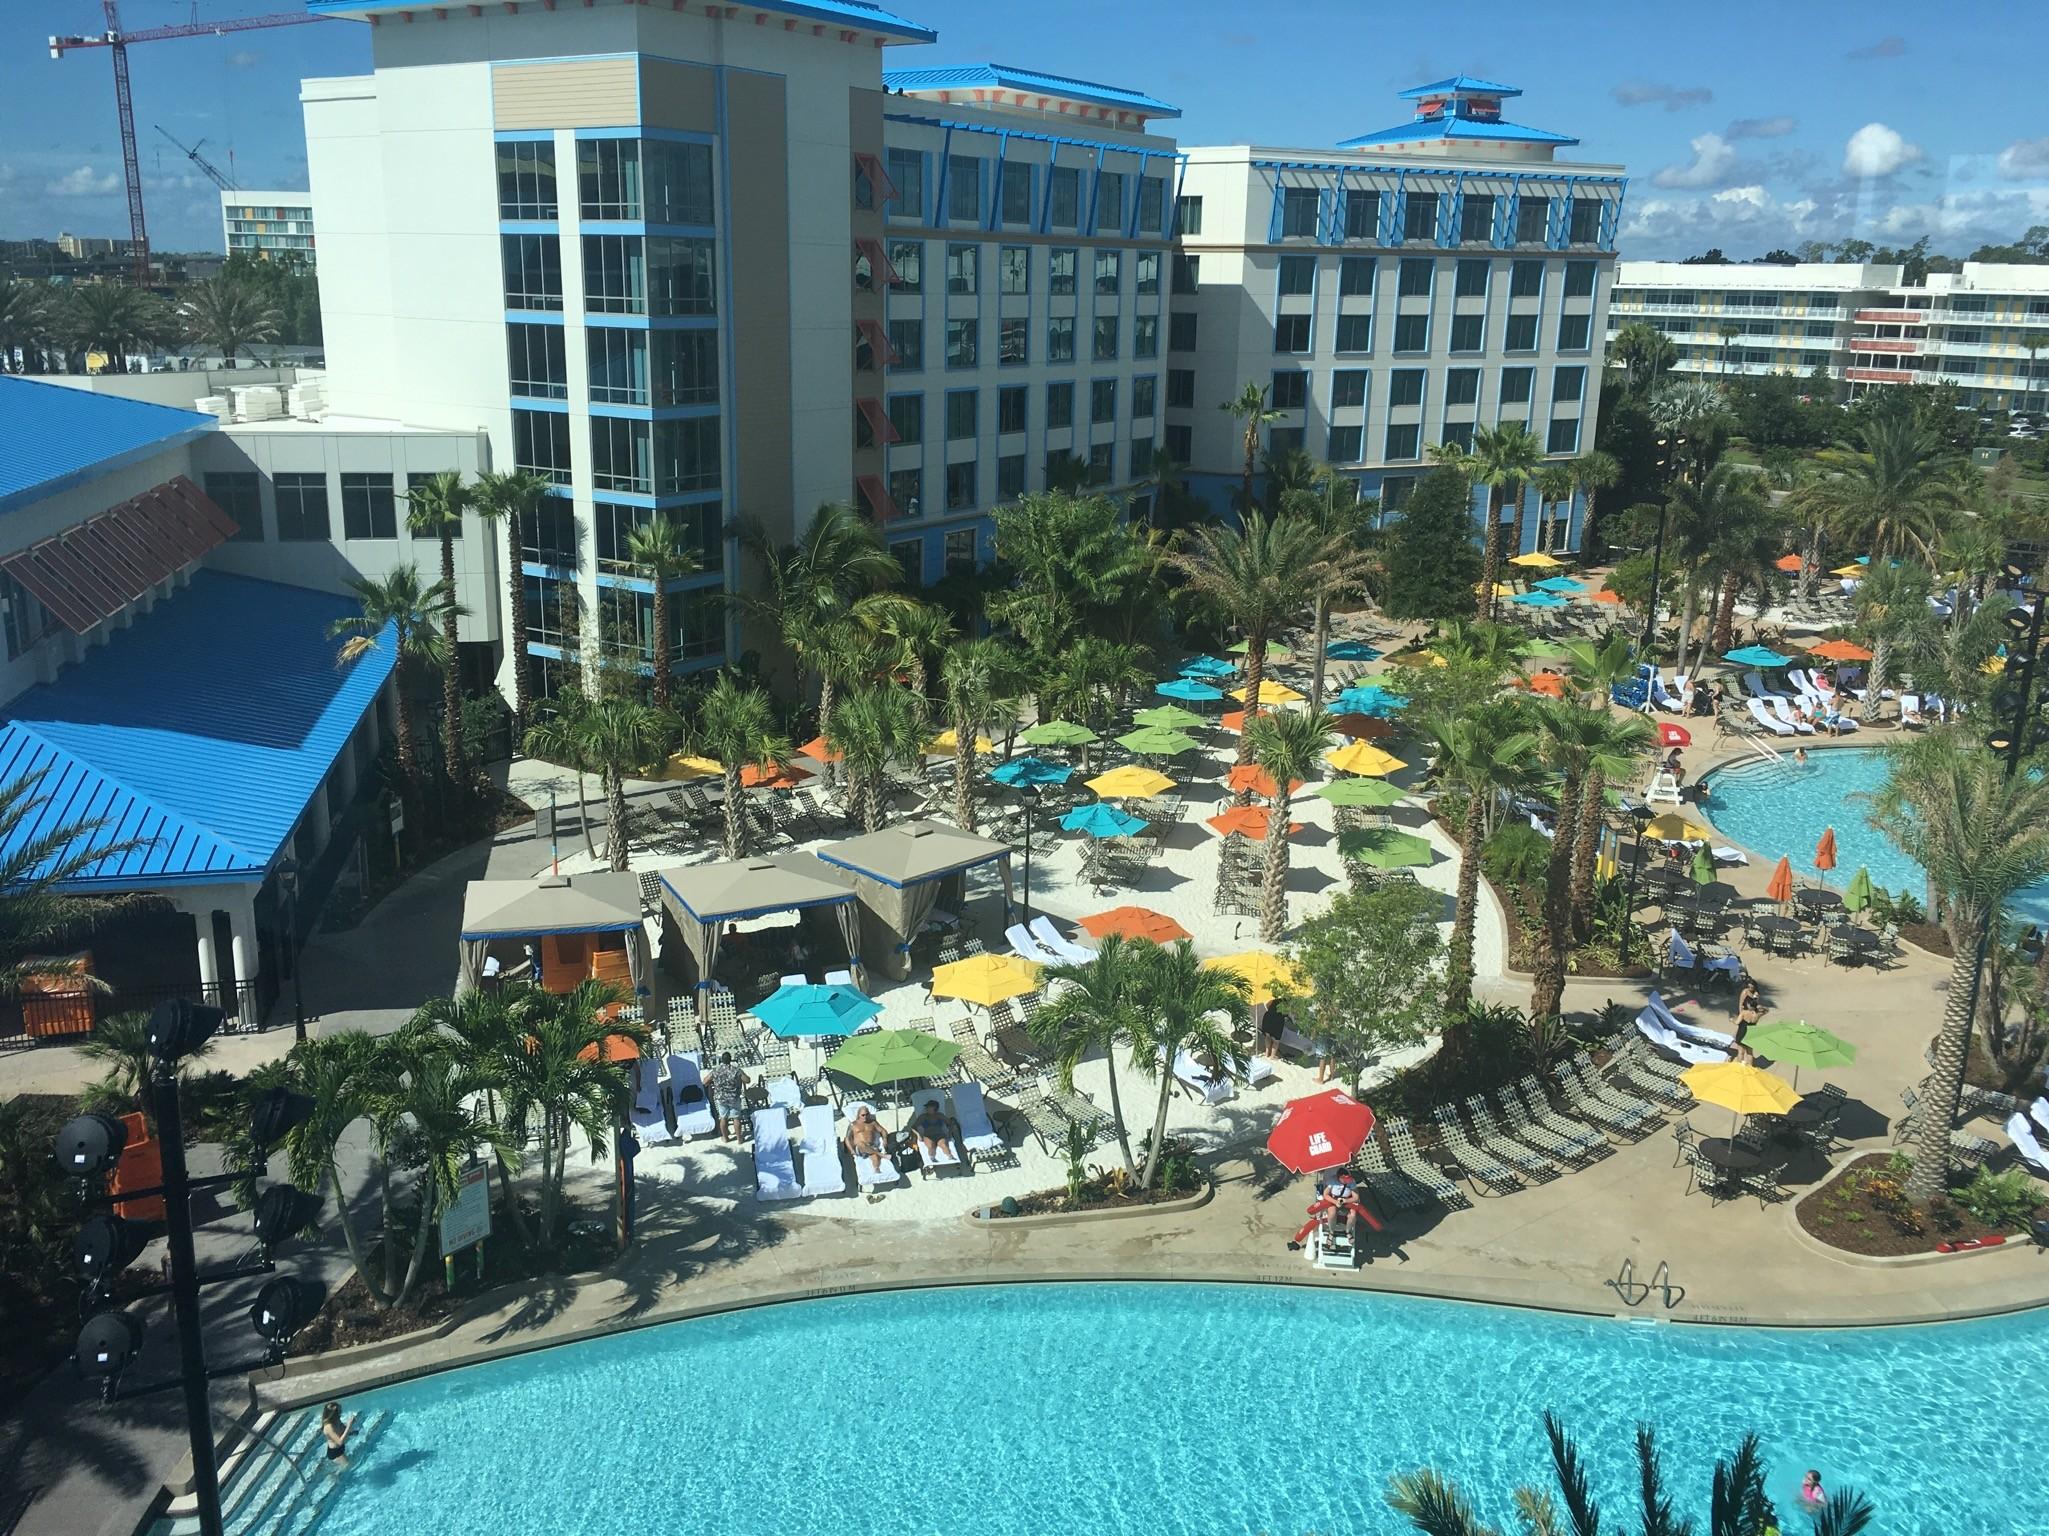 Universal Orlandos new Loews Sapphire Falls Resort is now